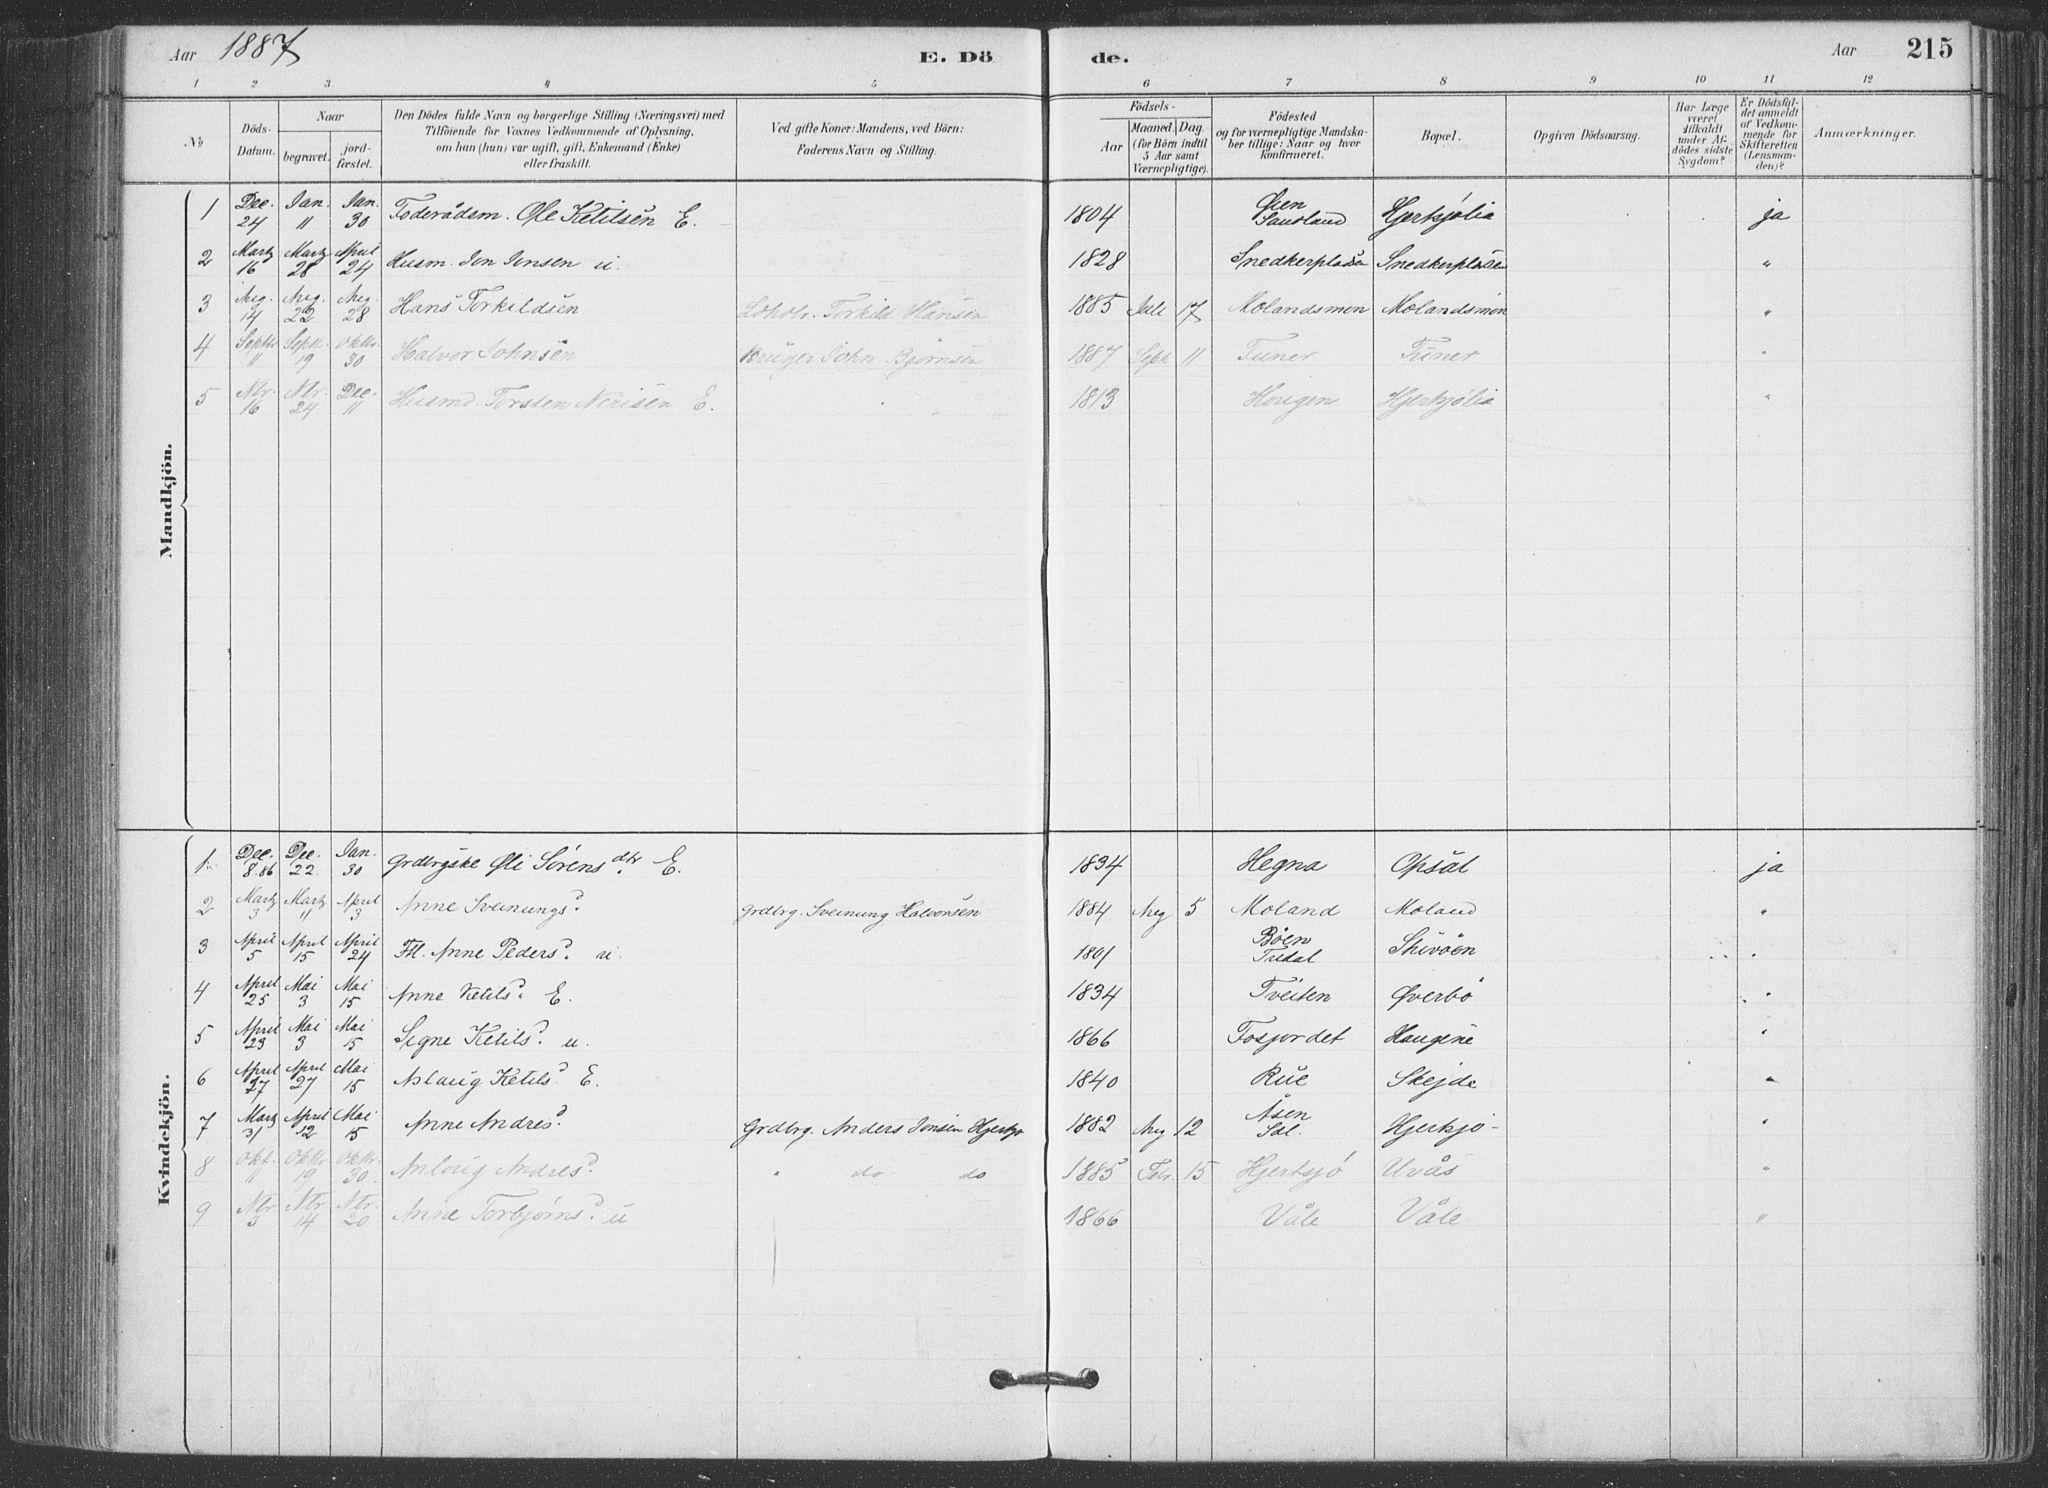 SAKO, Hjartdal kirkebøker, F/Fa/L0010: Ministerialbok nr. I 10, 1880-1929, s. 215